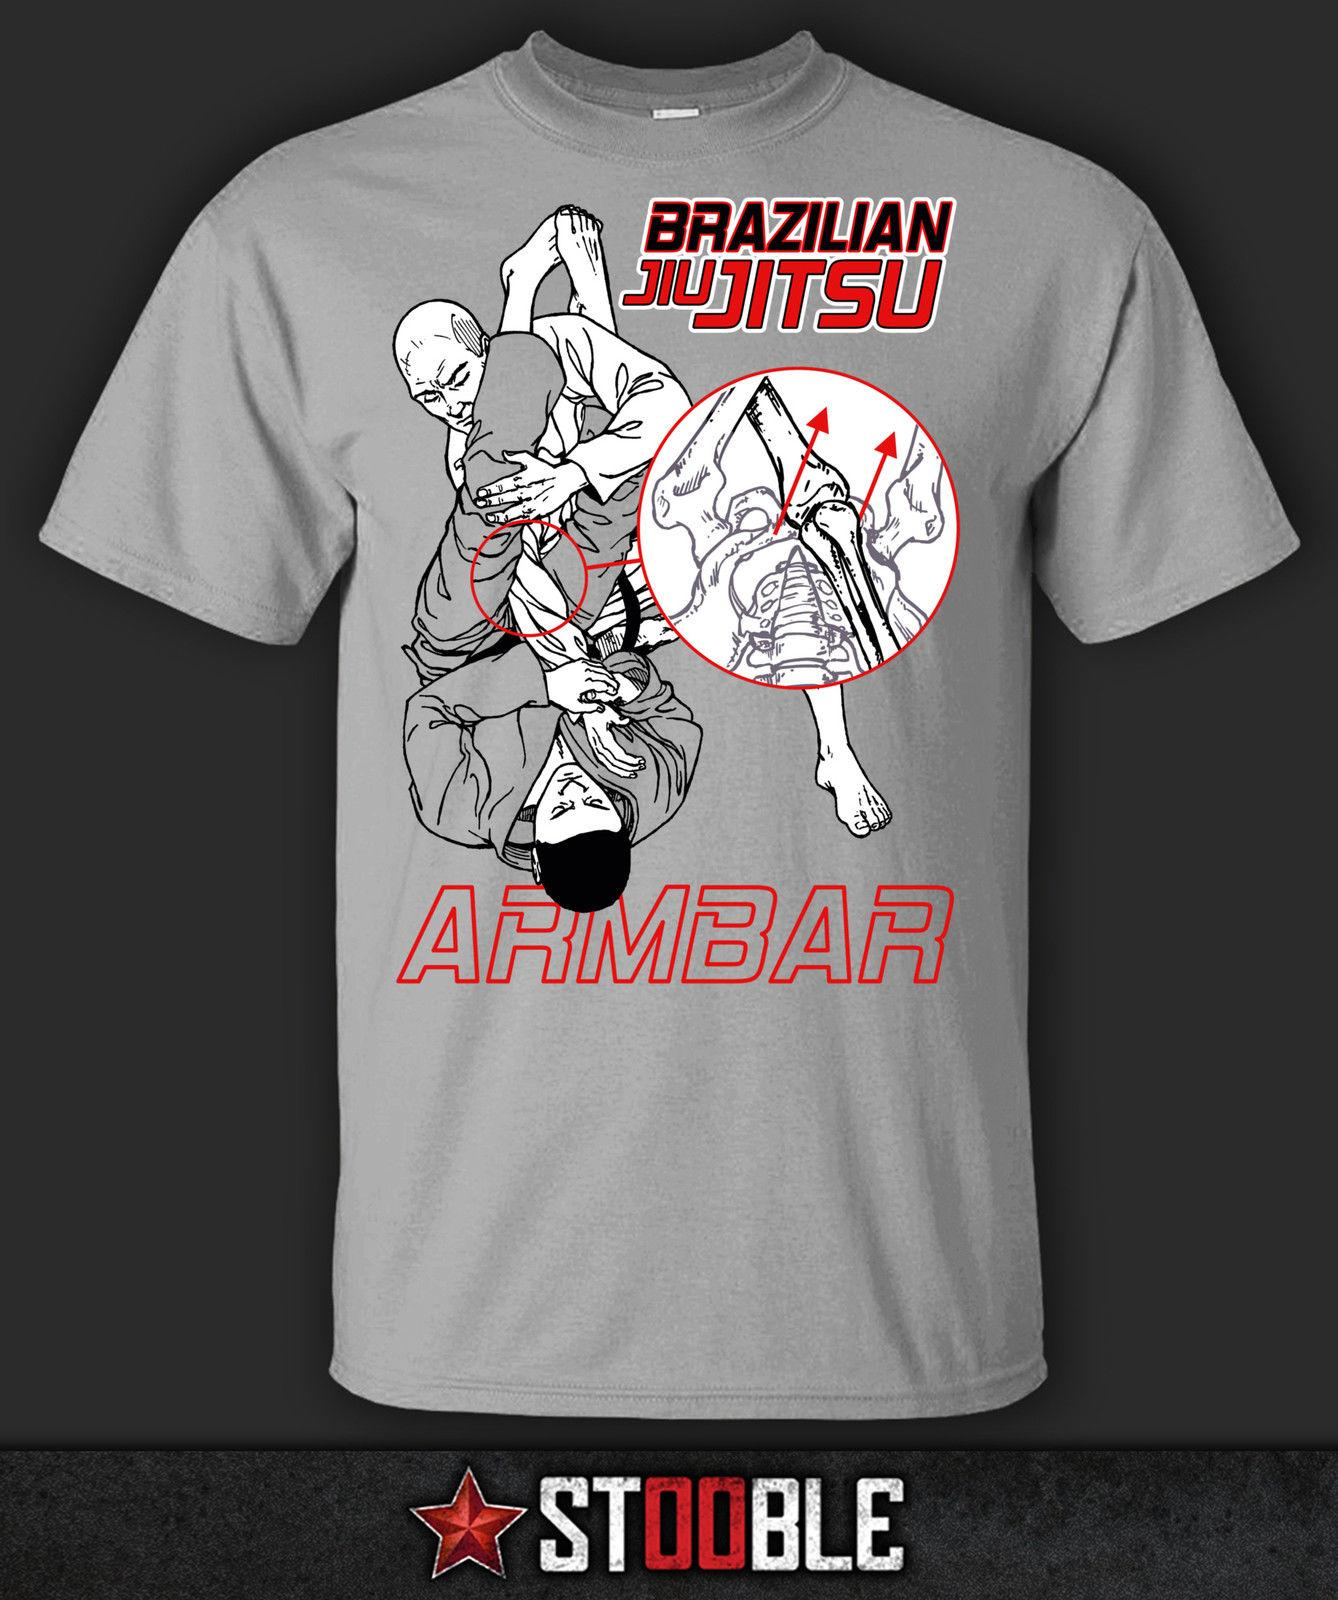 BJJ Brazilian Jiu Jitsu Armbar T Shirt Direct From StockistFunny Unisex Casual Tee Gift Themed Shirts Latest T Shirts Design From Buttonitbadges, ...